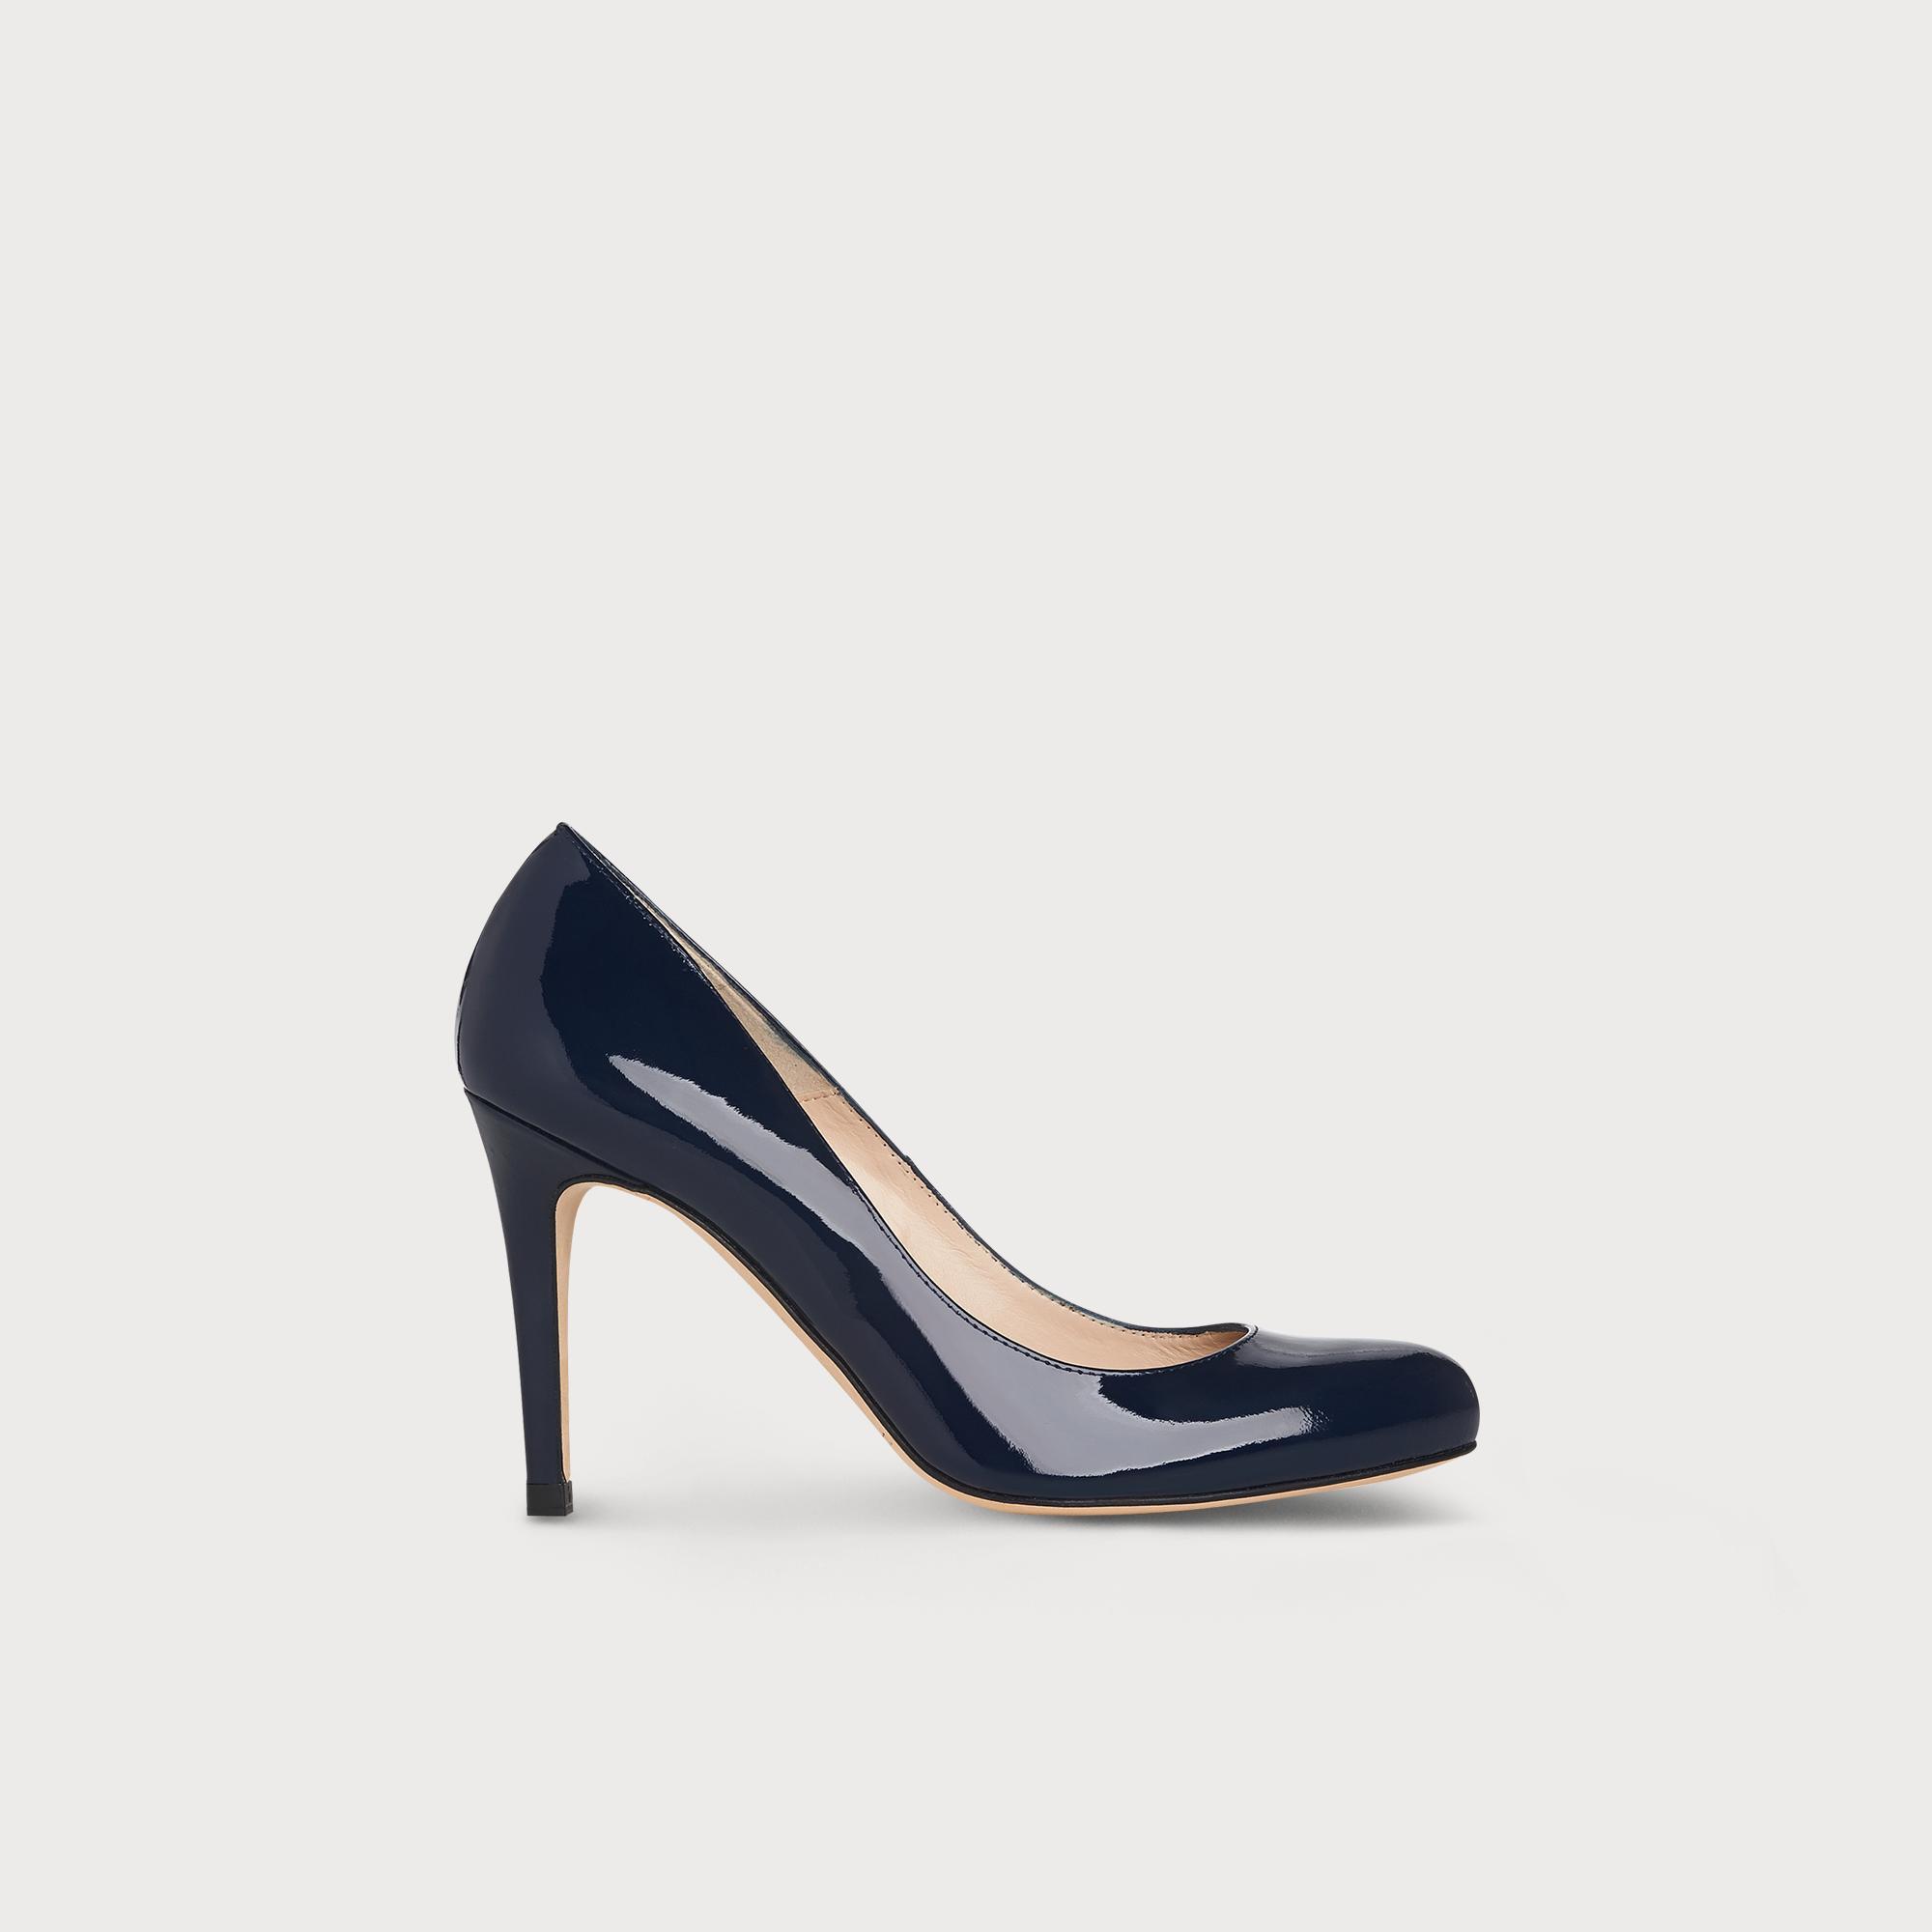 d87ca484eb15 Stila Navy Patent Leather Heel